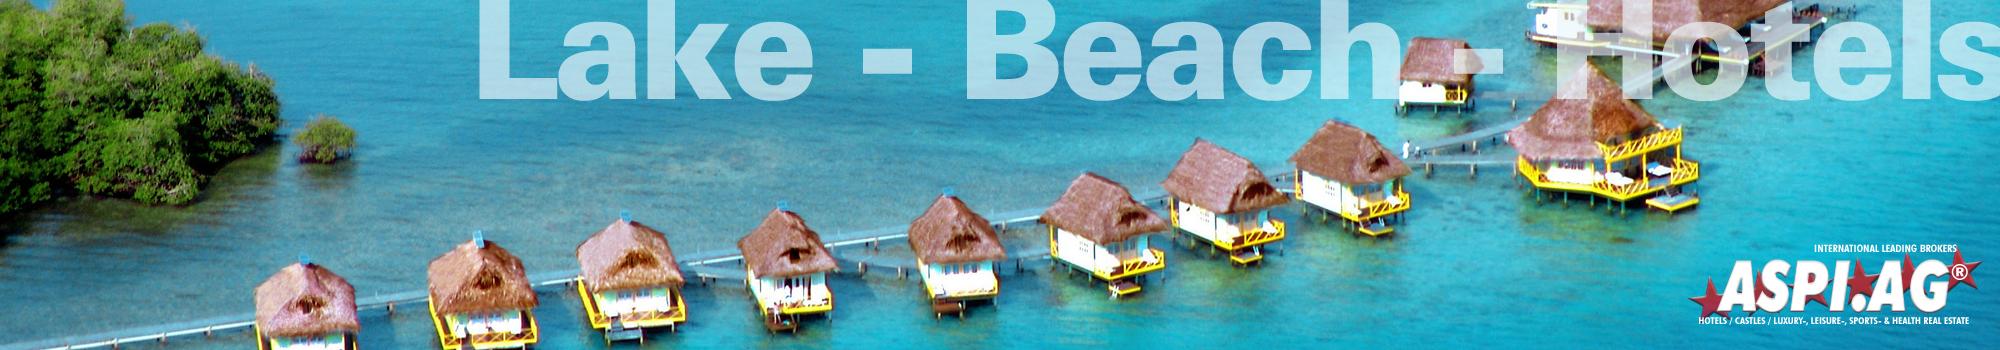 Beachhotel beach resor Strandhotels Seehotel kaufen bei Hotelmakler ASPI AG